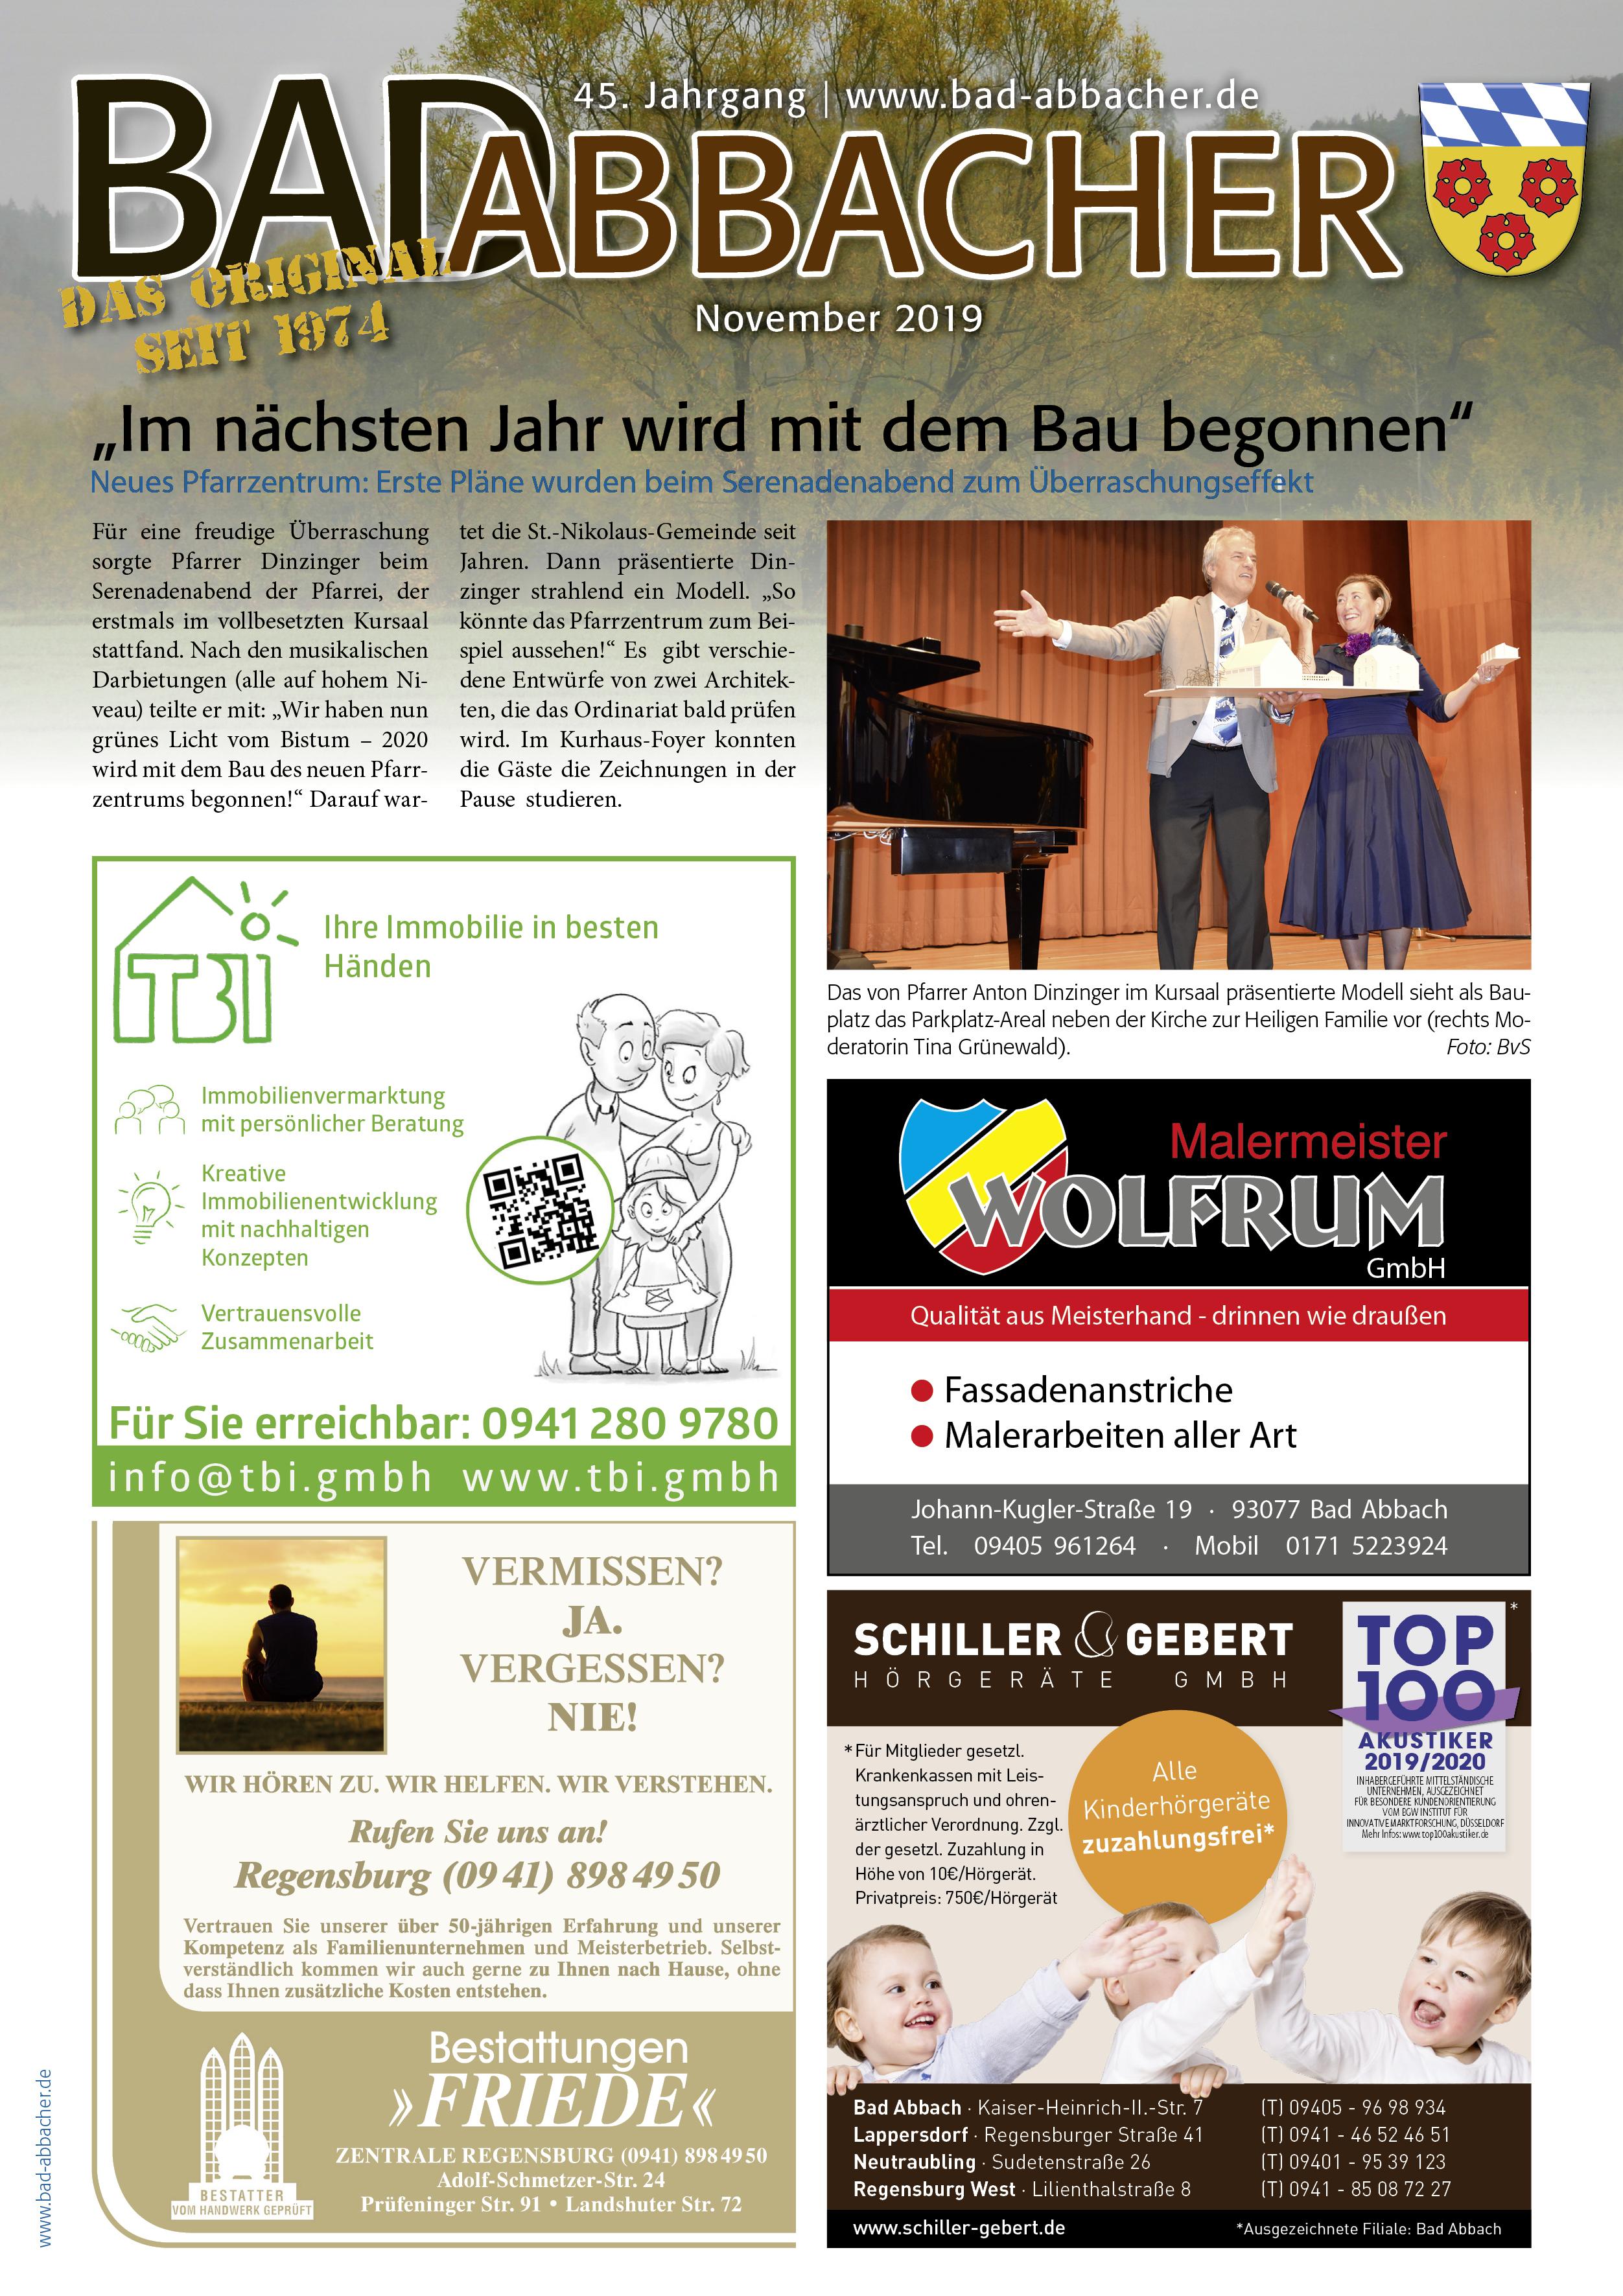 Bad-Abbacher_2019-11